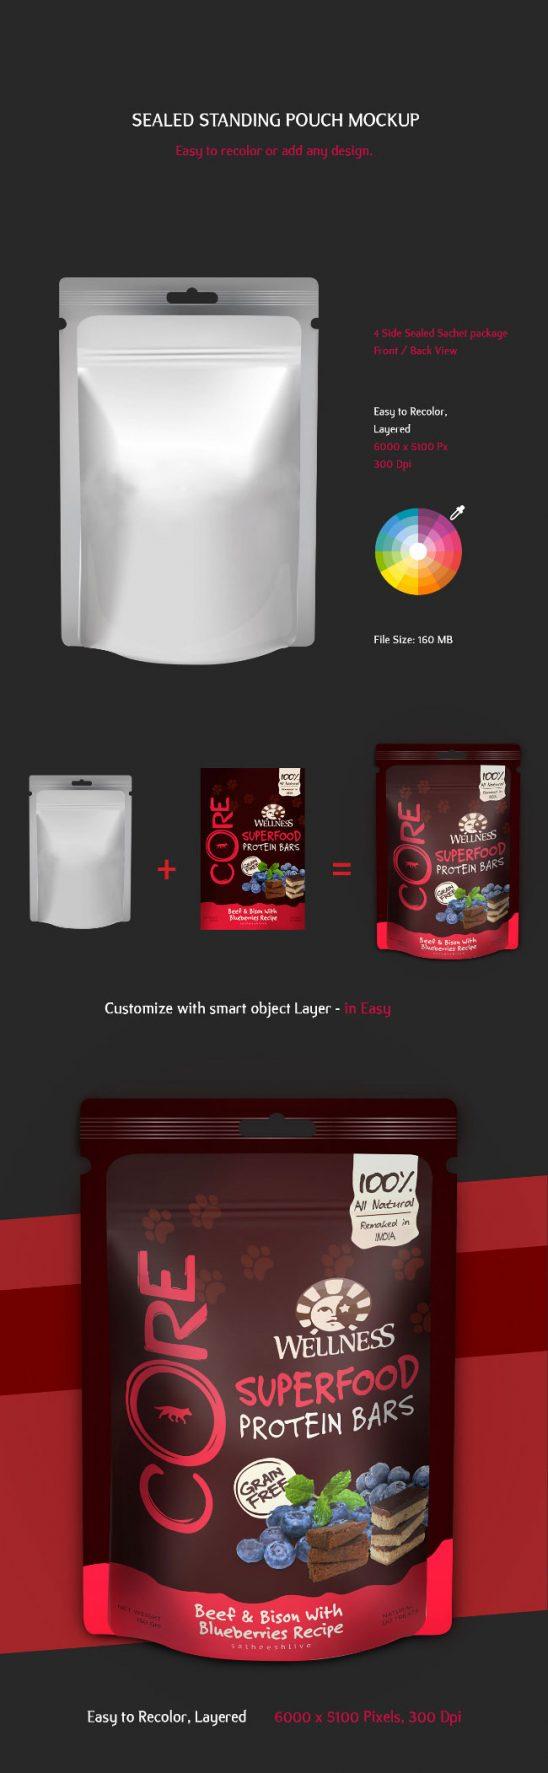 p423 548x1773 - موکاپ ساندیس لایه باز پاکت آبمیوه یا ادویه جات مواد غذایی